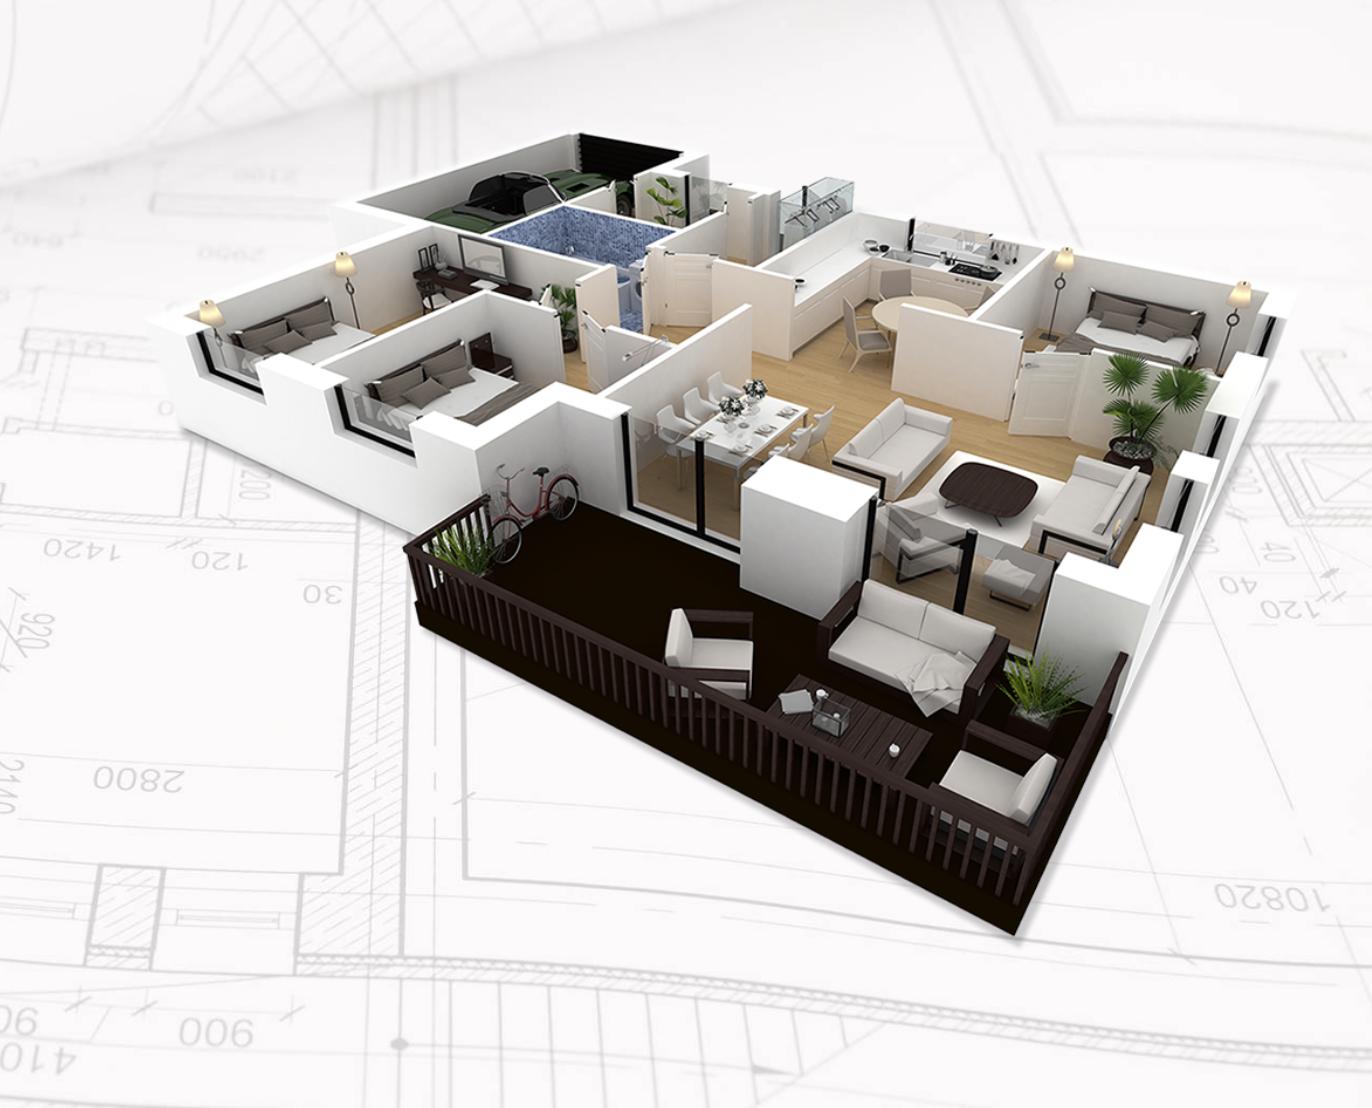 Elm Home Designs image 2